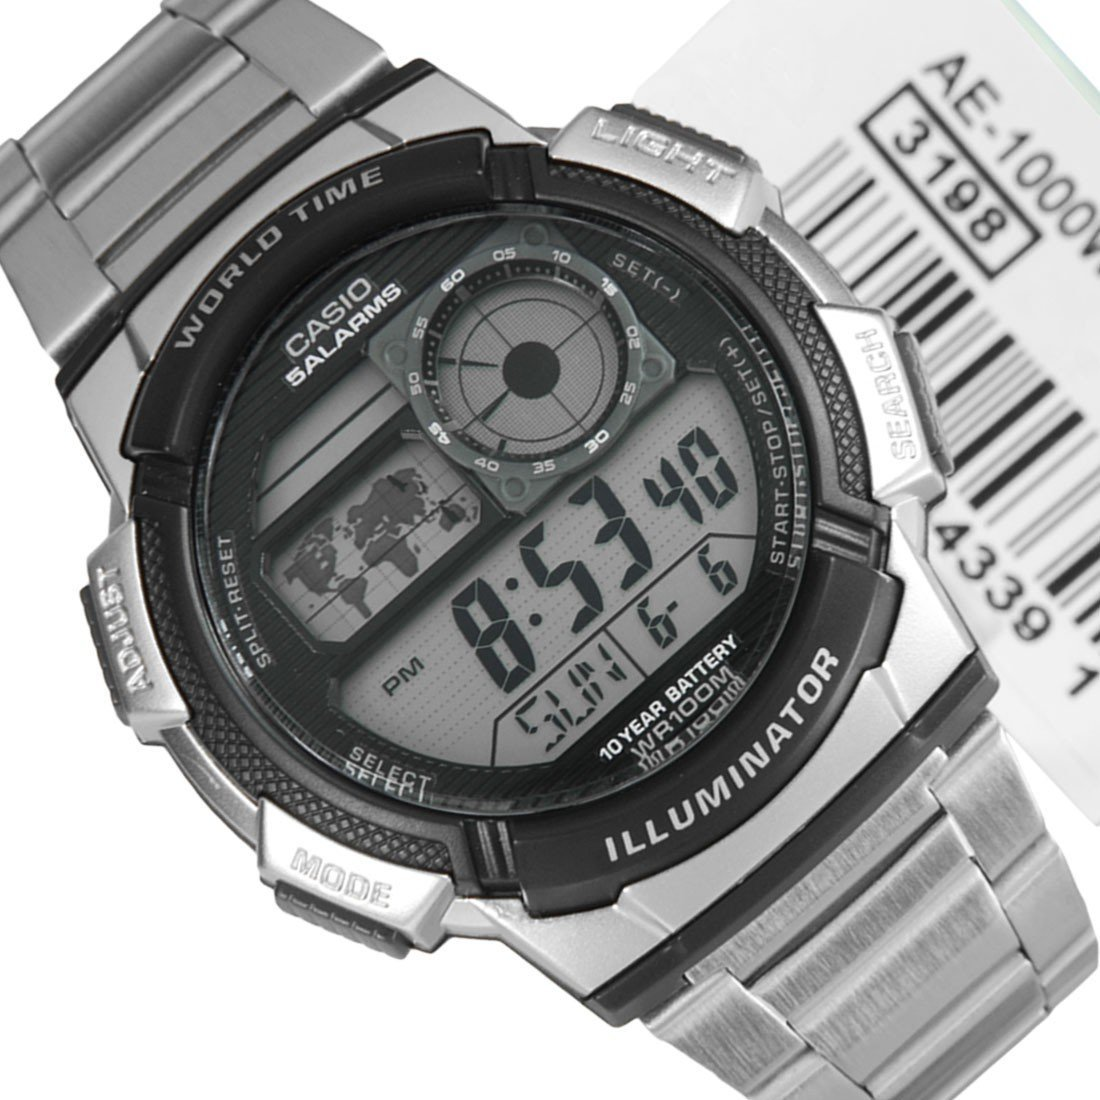 Casio World Time Digital Watch R59300 Watches Pricecheck Sa Ae 1000w 1a Original X